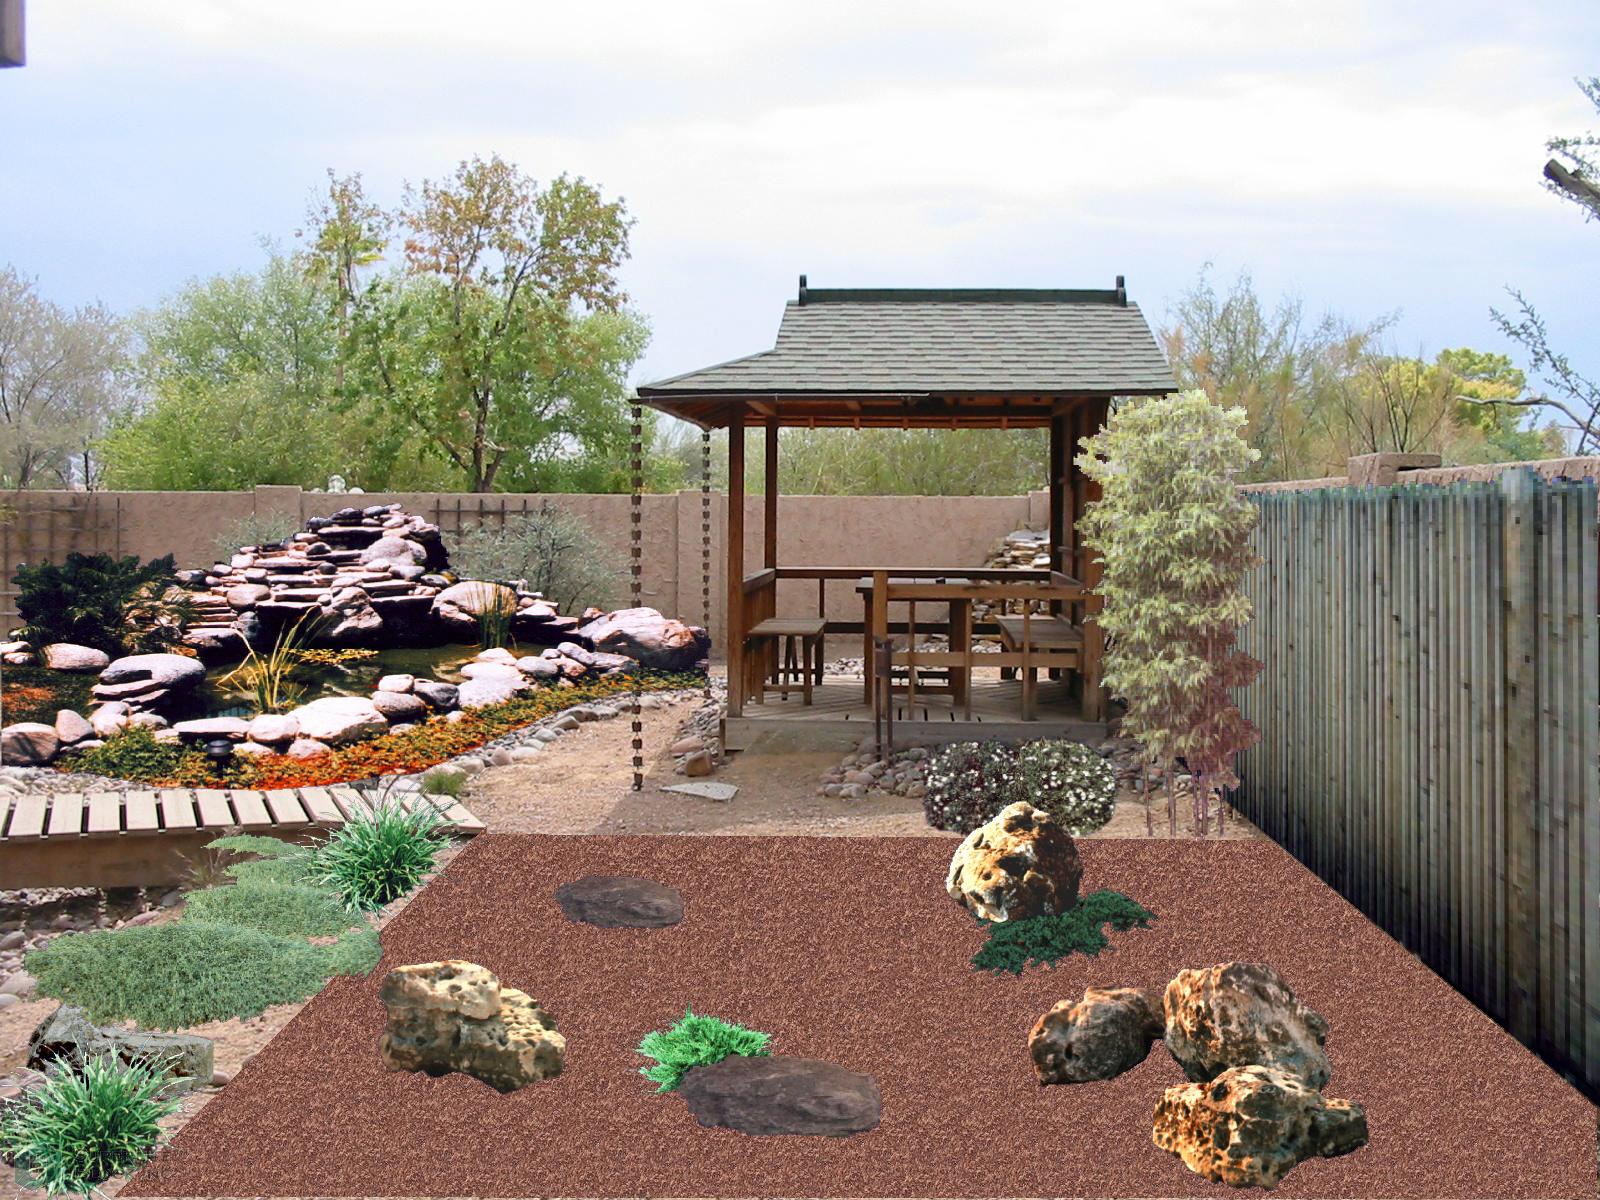 Landscape Ideas For Small Gardens A Japanese Garden in the Desert?